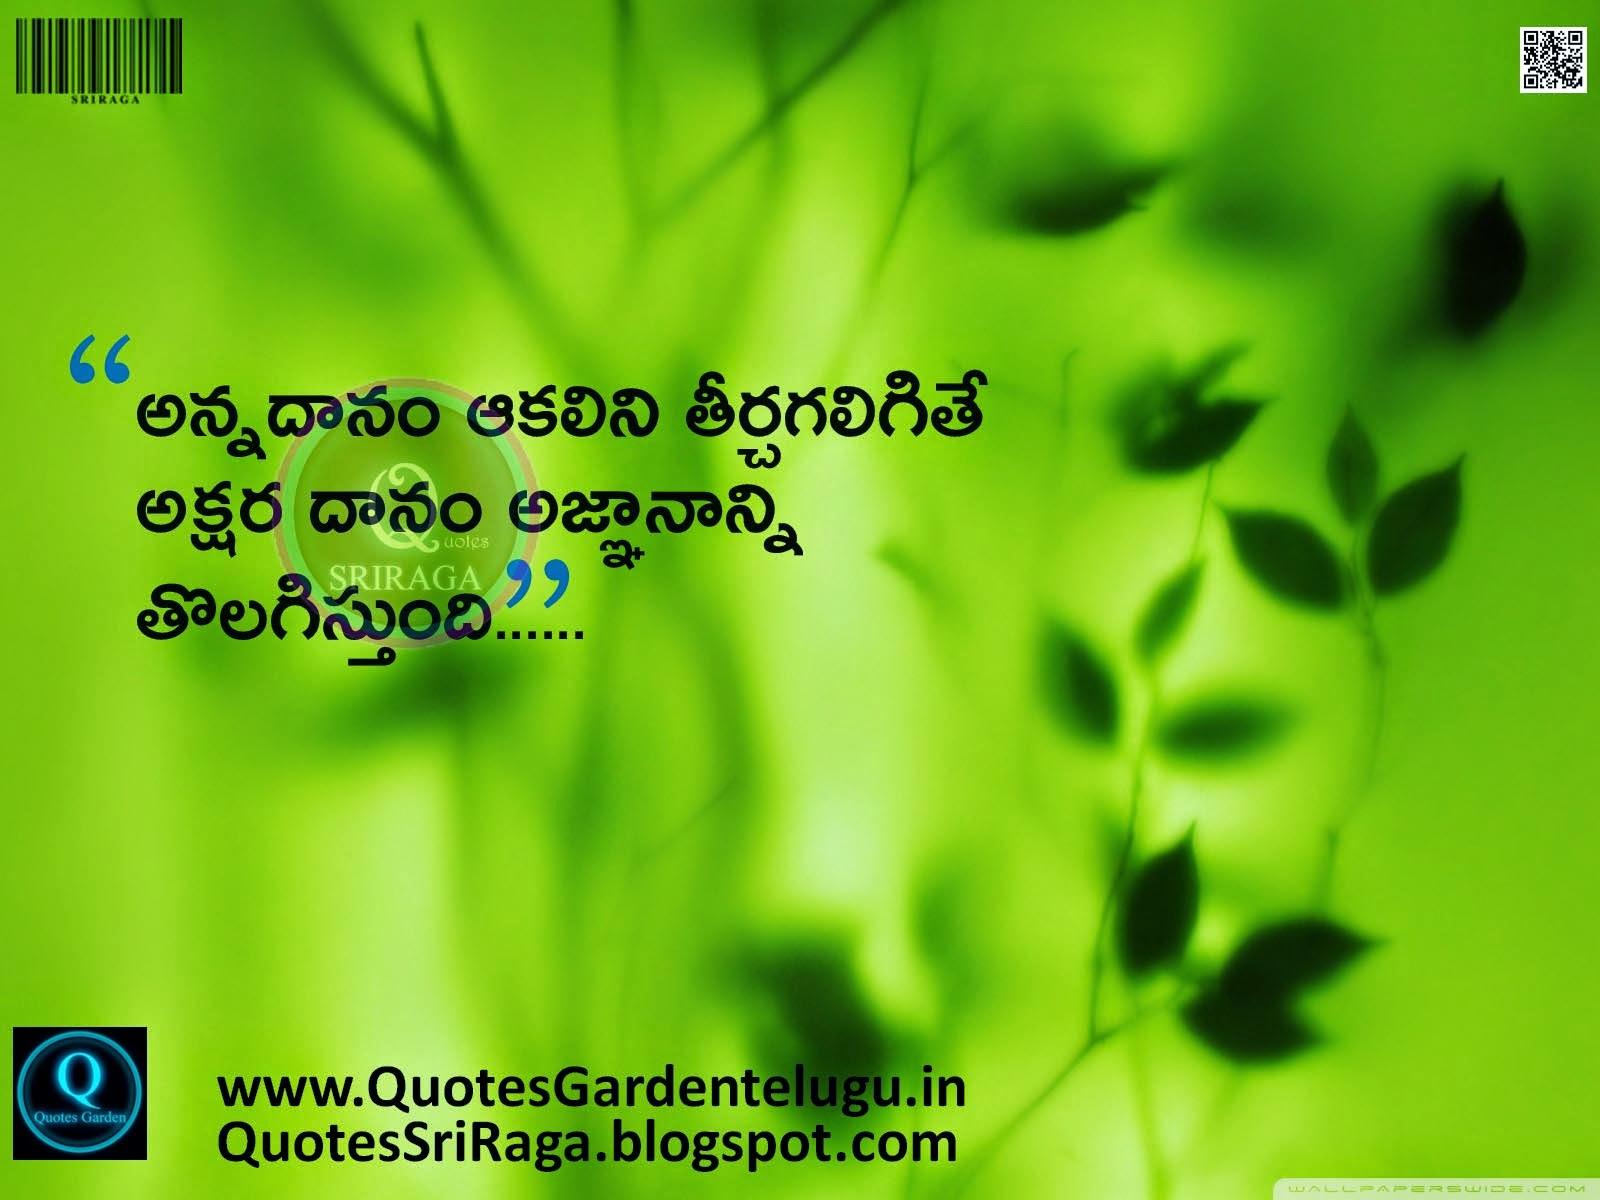 BestTelugu Educational inspirational Quotes images